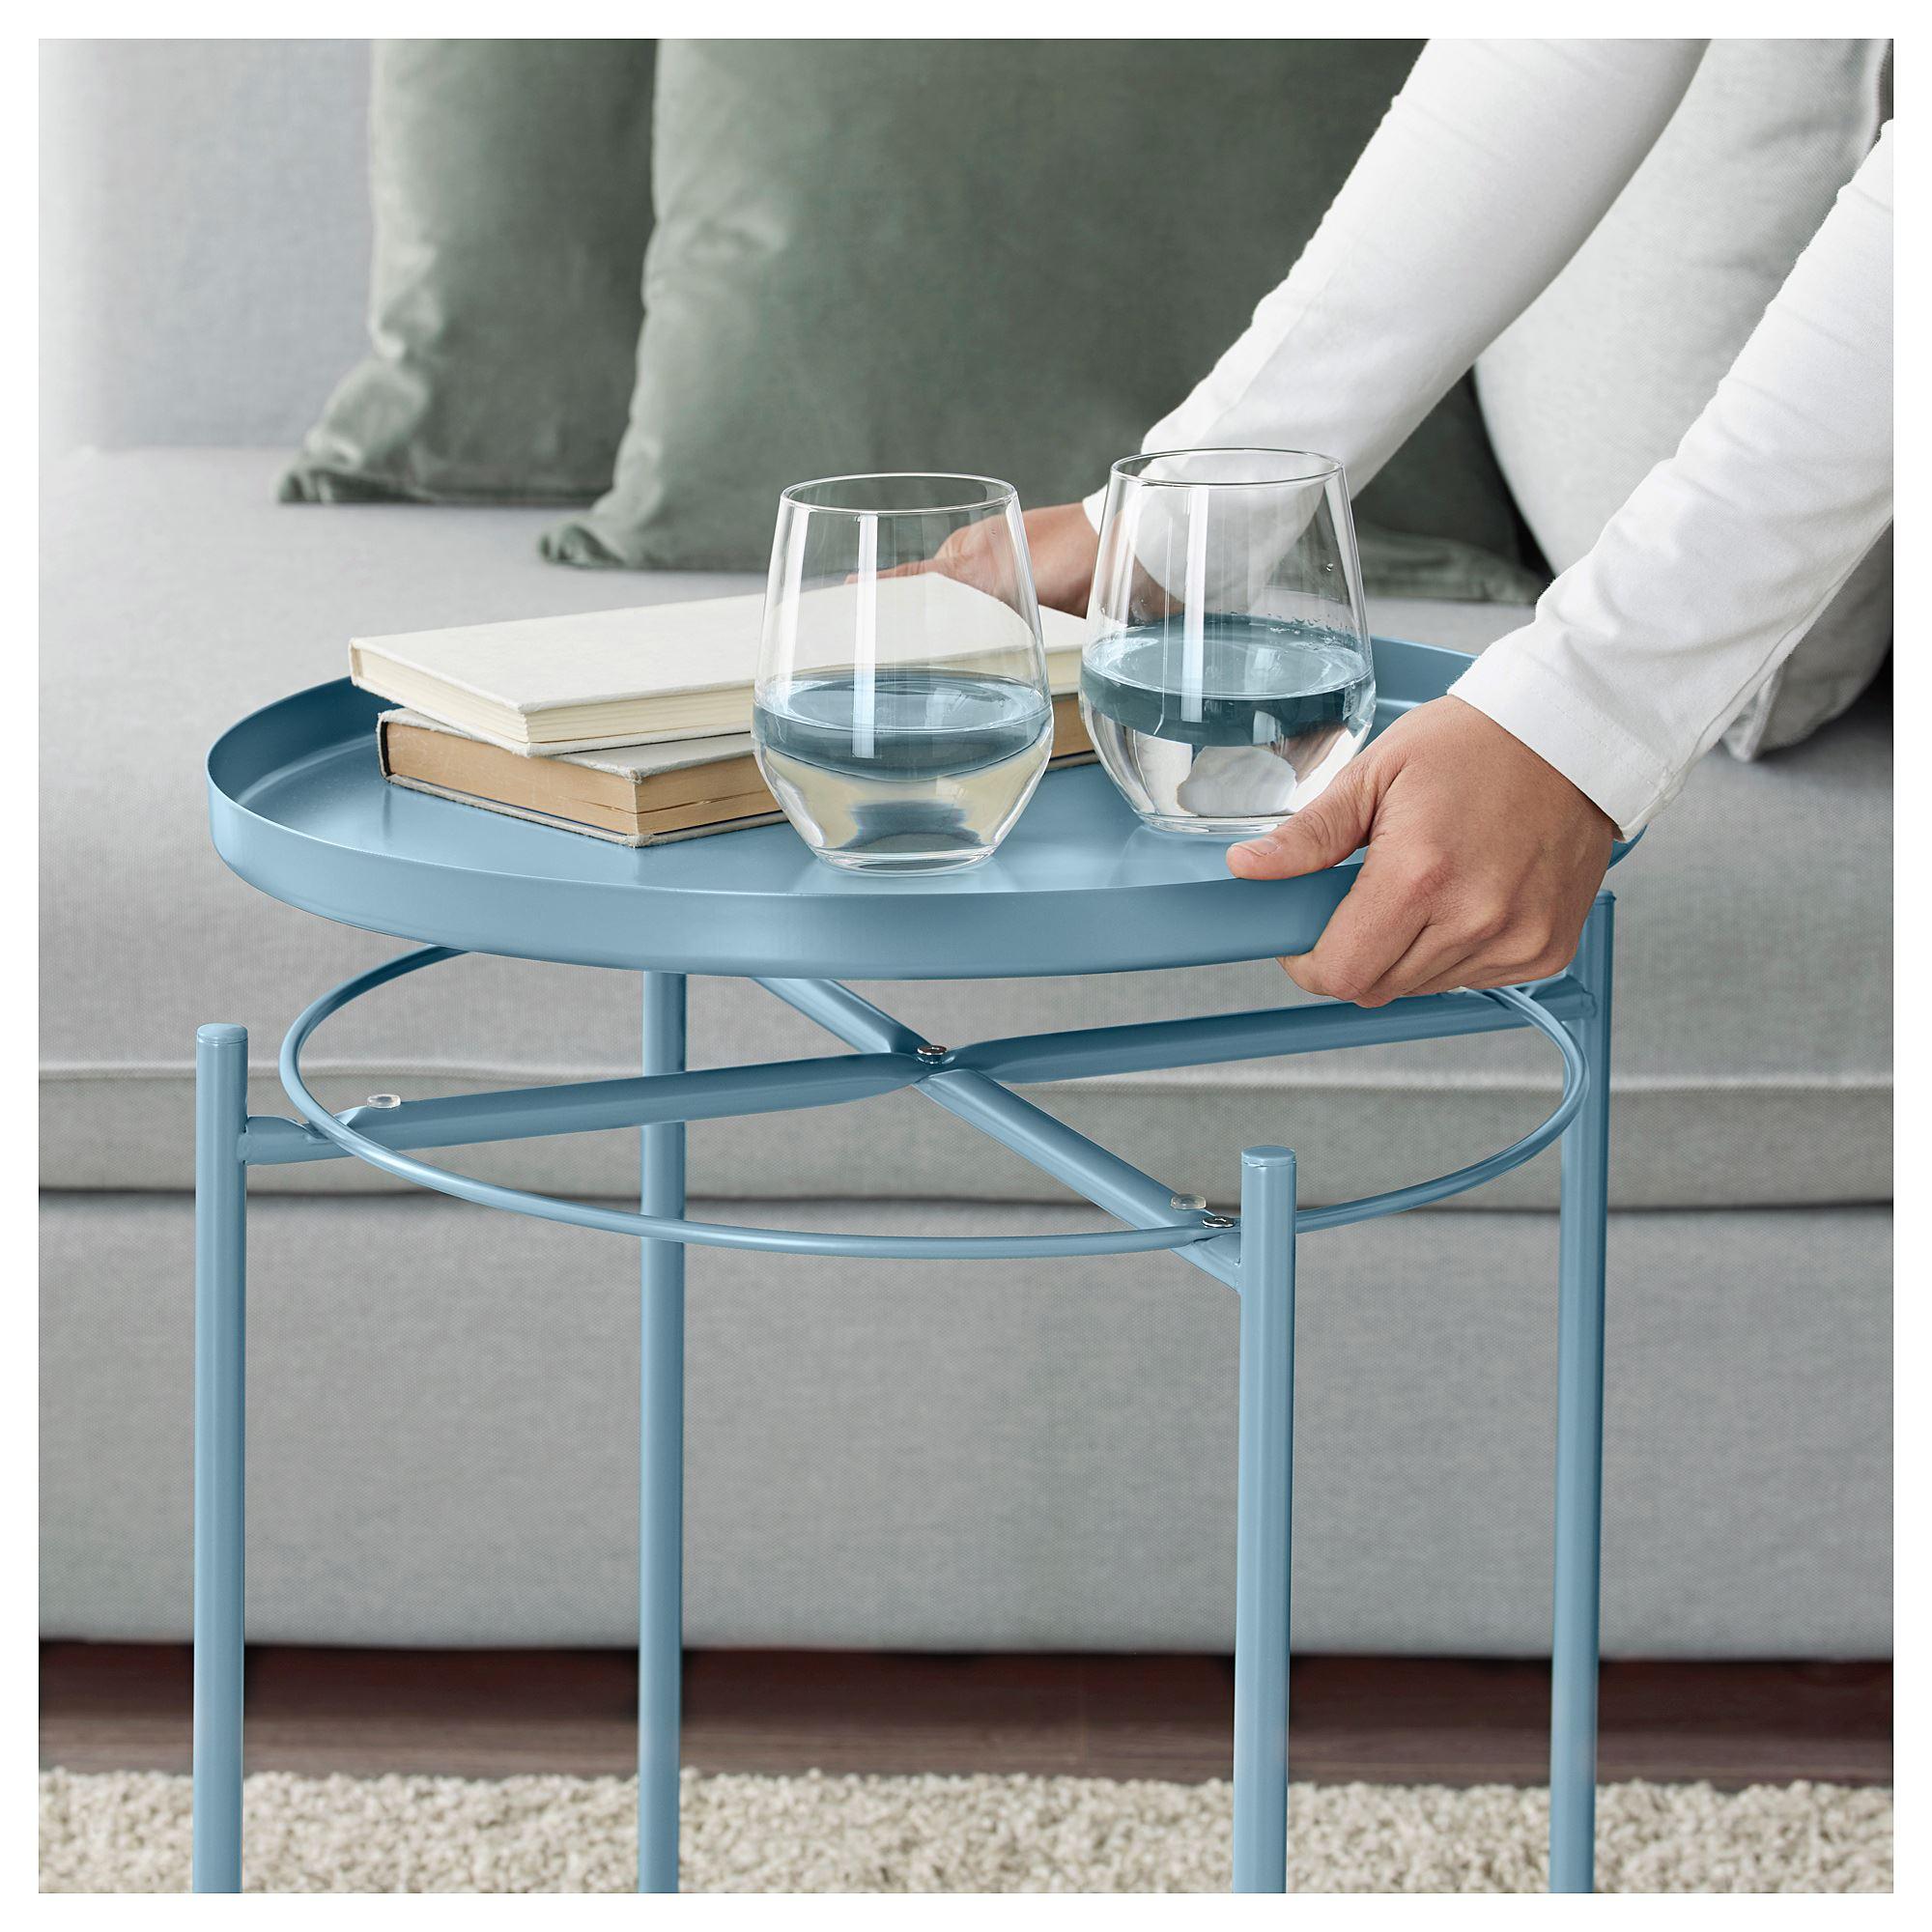 Gladom Tepsili Sehpa Mavi 45x53 Cm Ikea Oturma Odalari